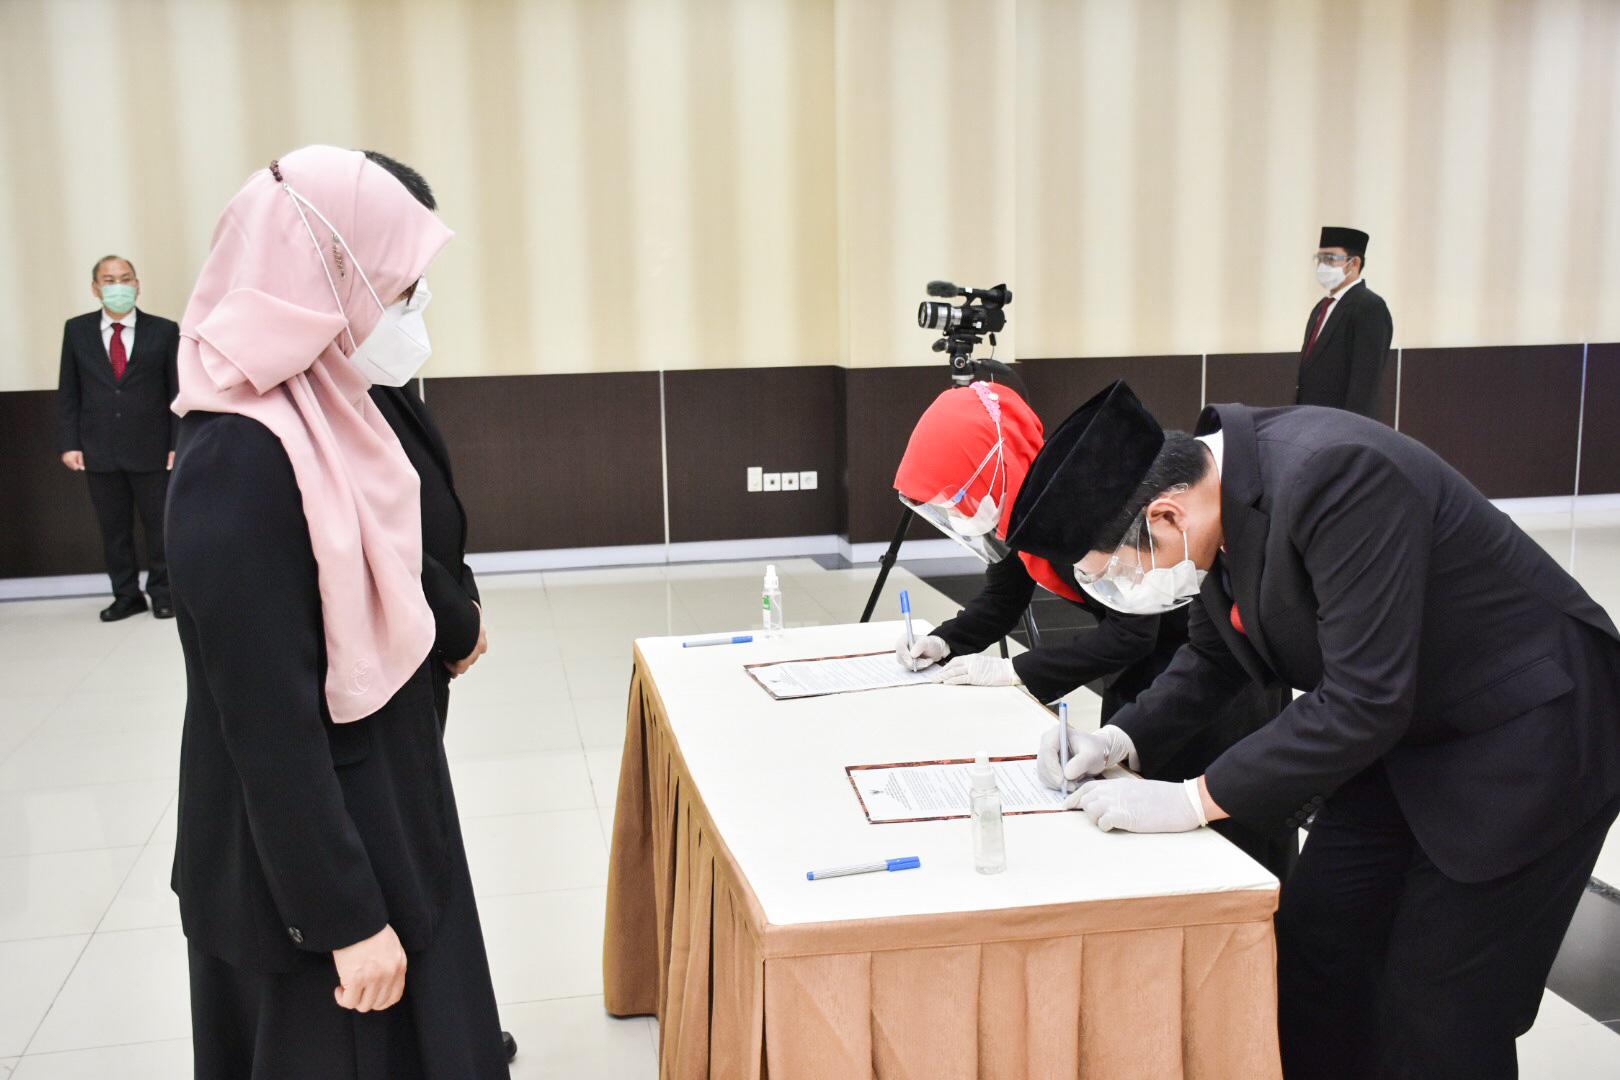 Penandatanganan Surat Keputusan bagi 23 Pegawai Negeri Sipil yang naik pangkat periode 1 April 2021 dan bagi dua orang pegawai yang memasuki masa purnabakti di Gedung Slamet Bratanata, Jakarta (05/04/